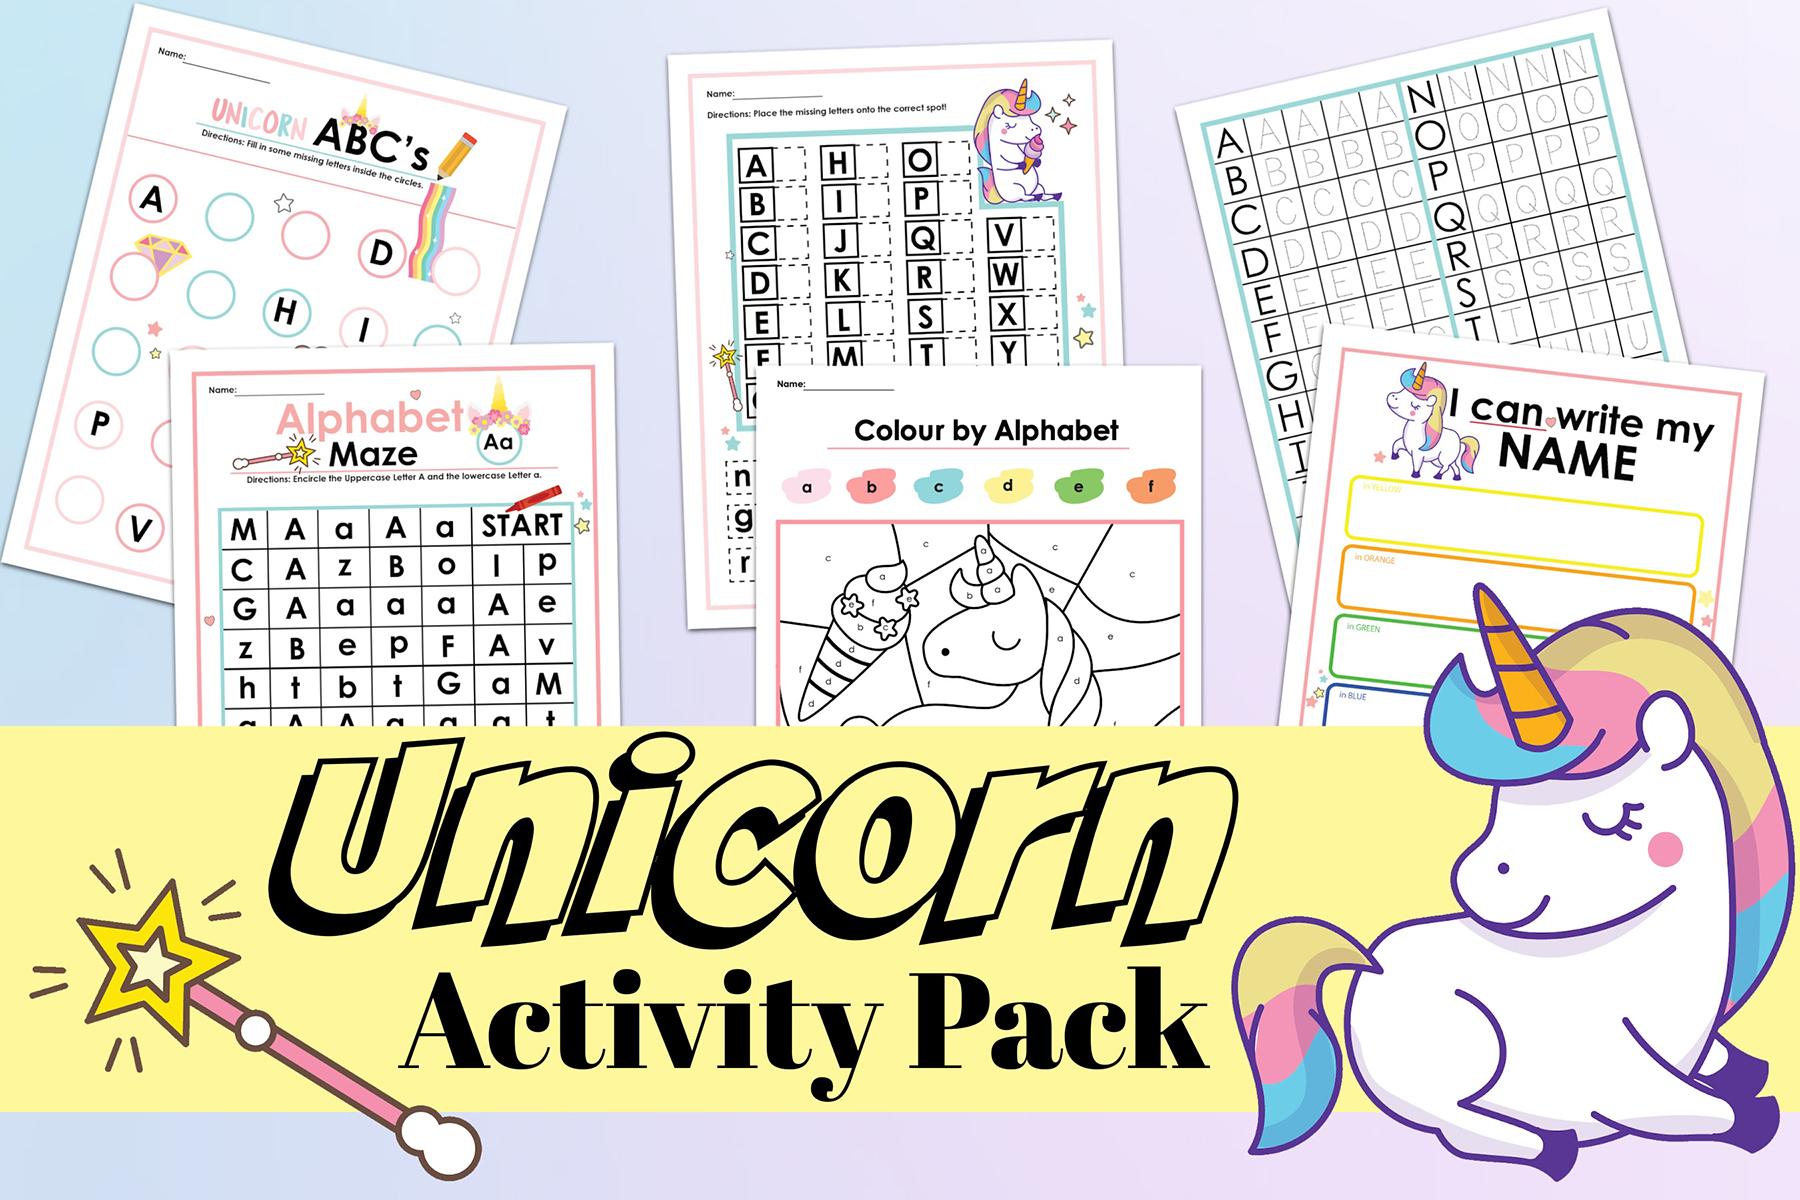 Unicorn Activity Pack